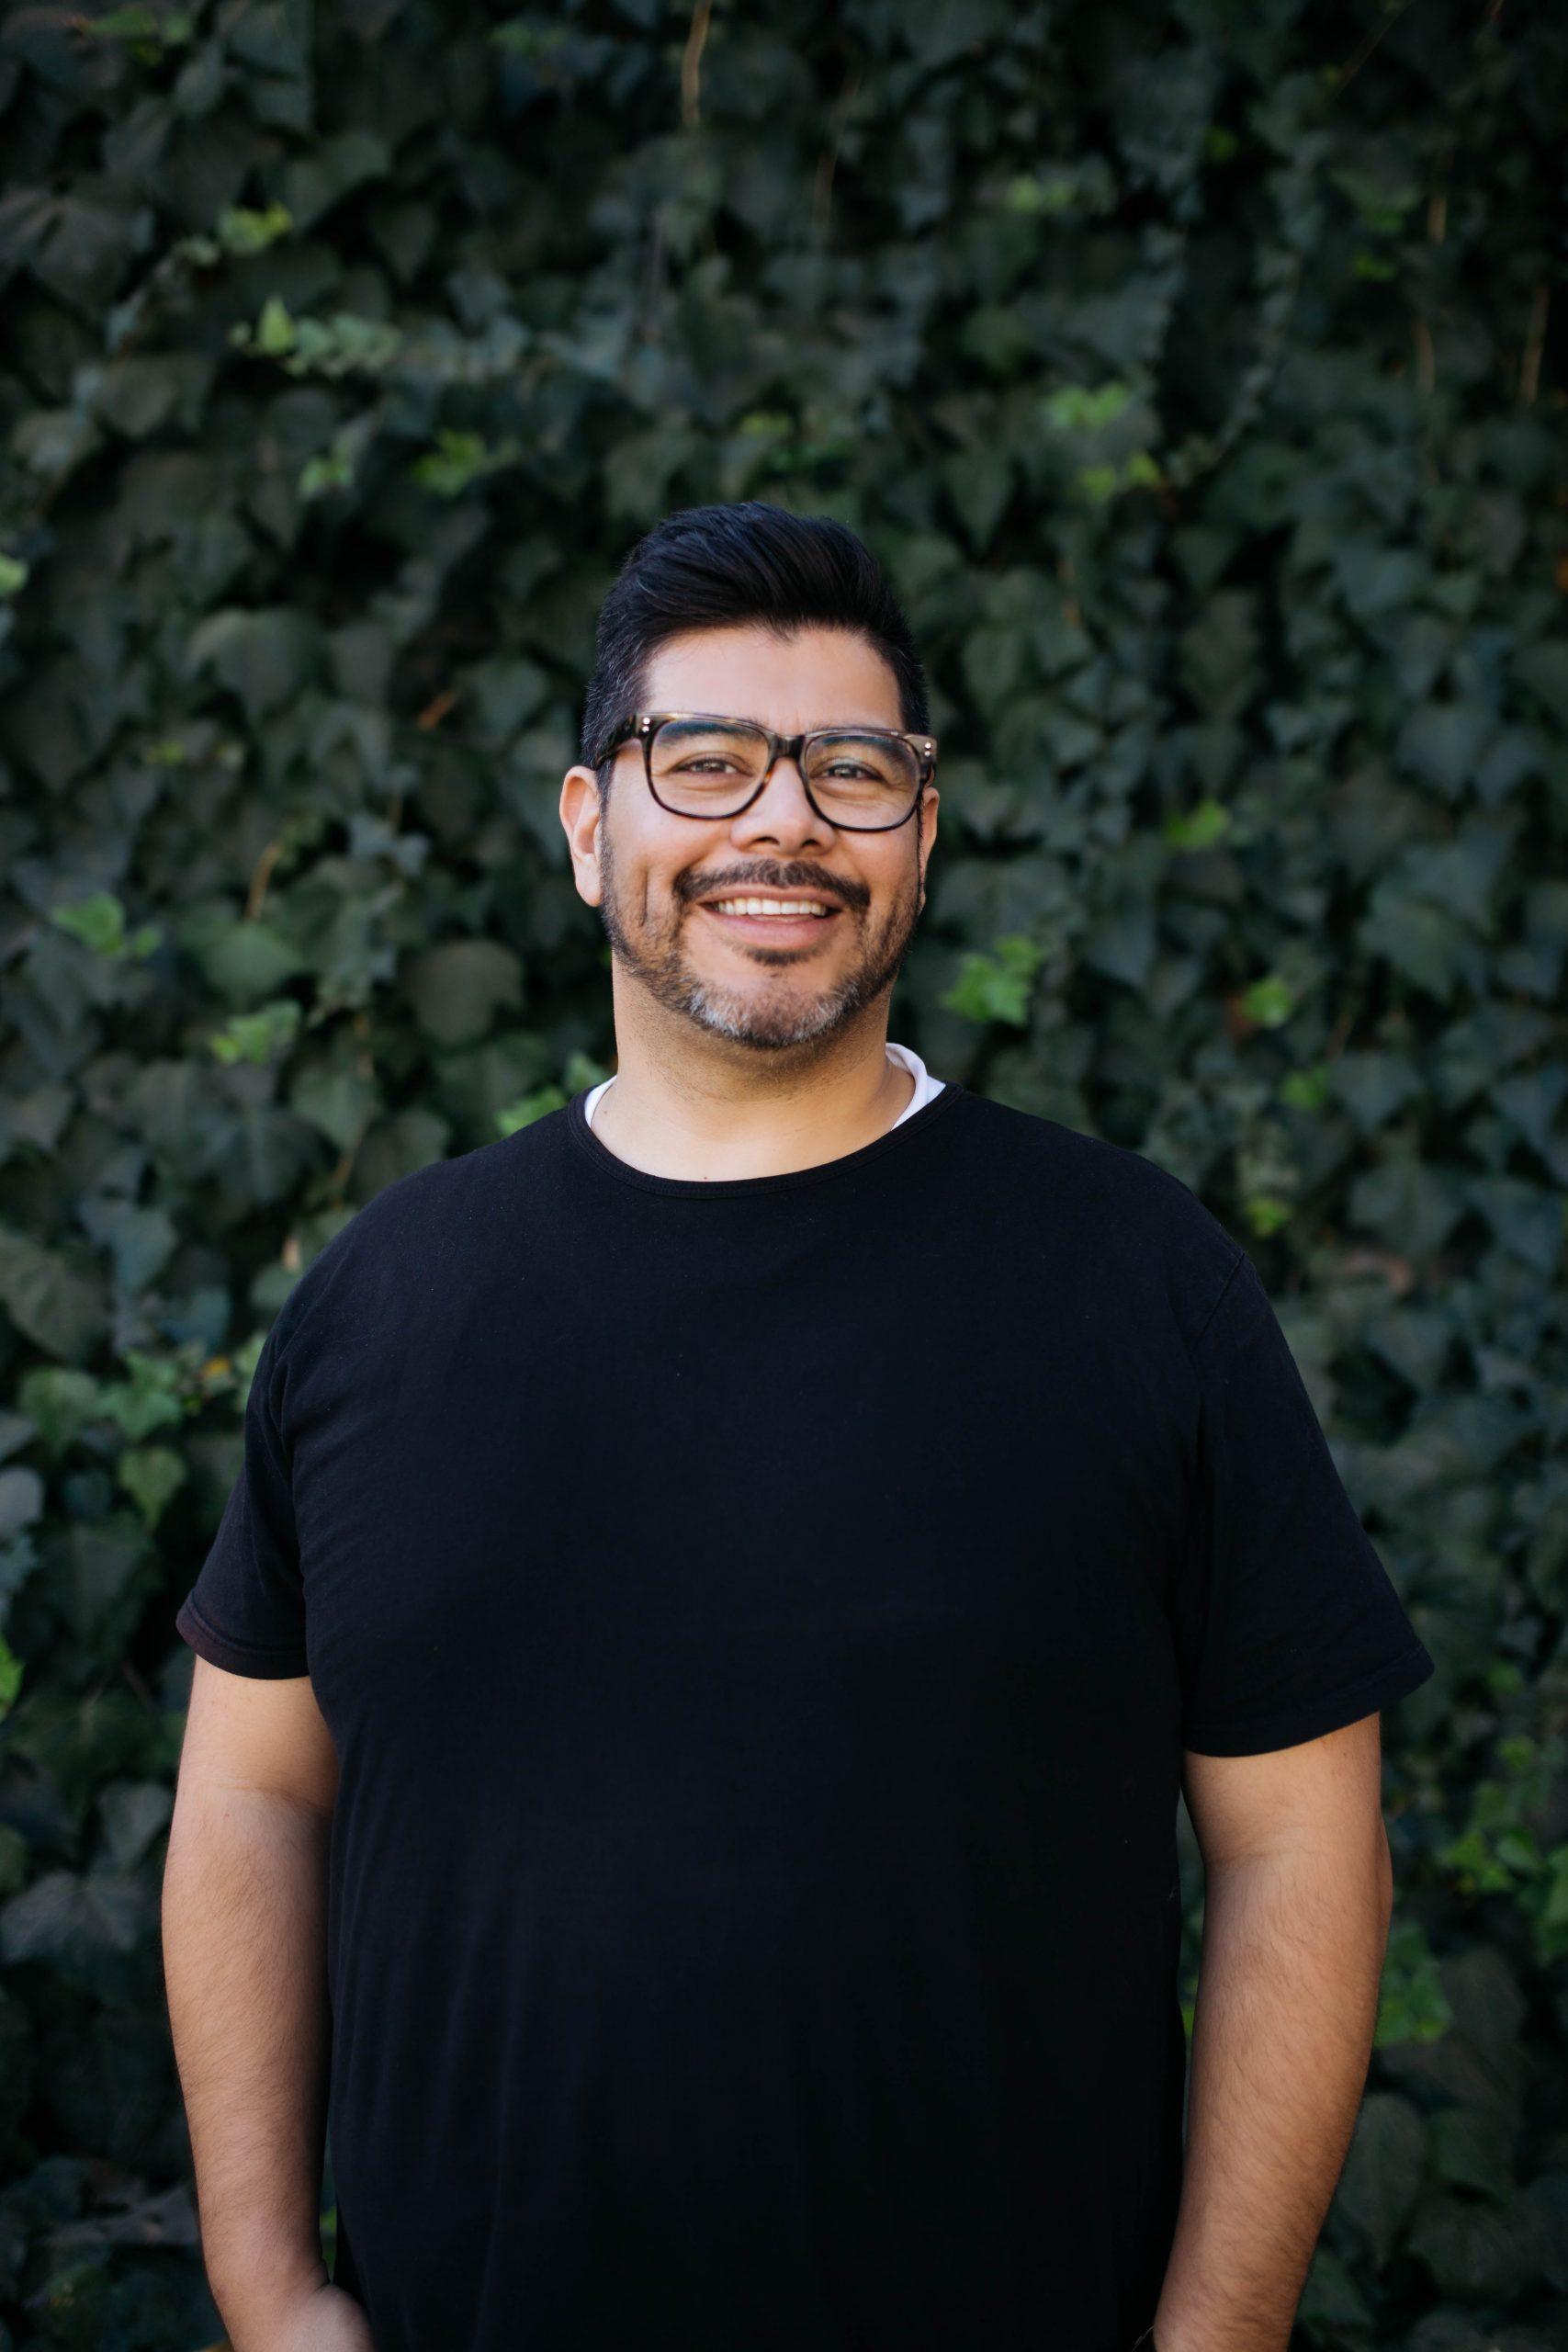 Photo of Emmanuel Hernandez.